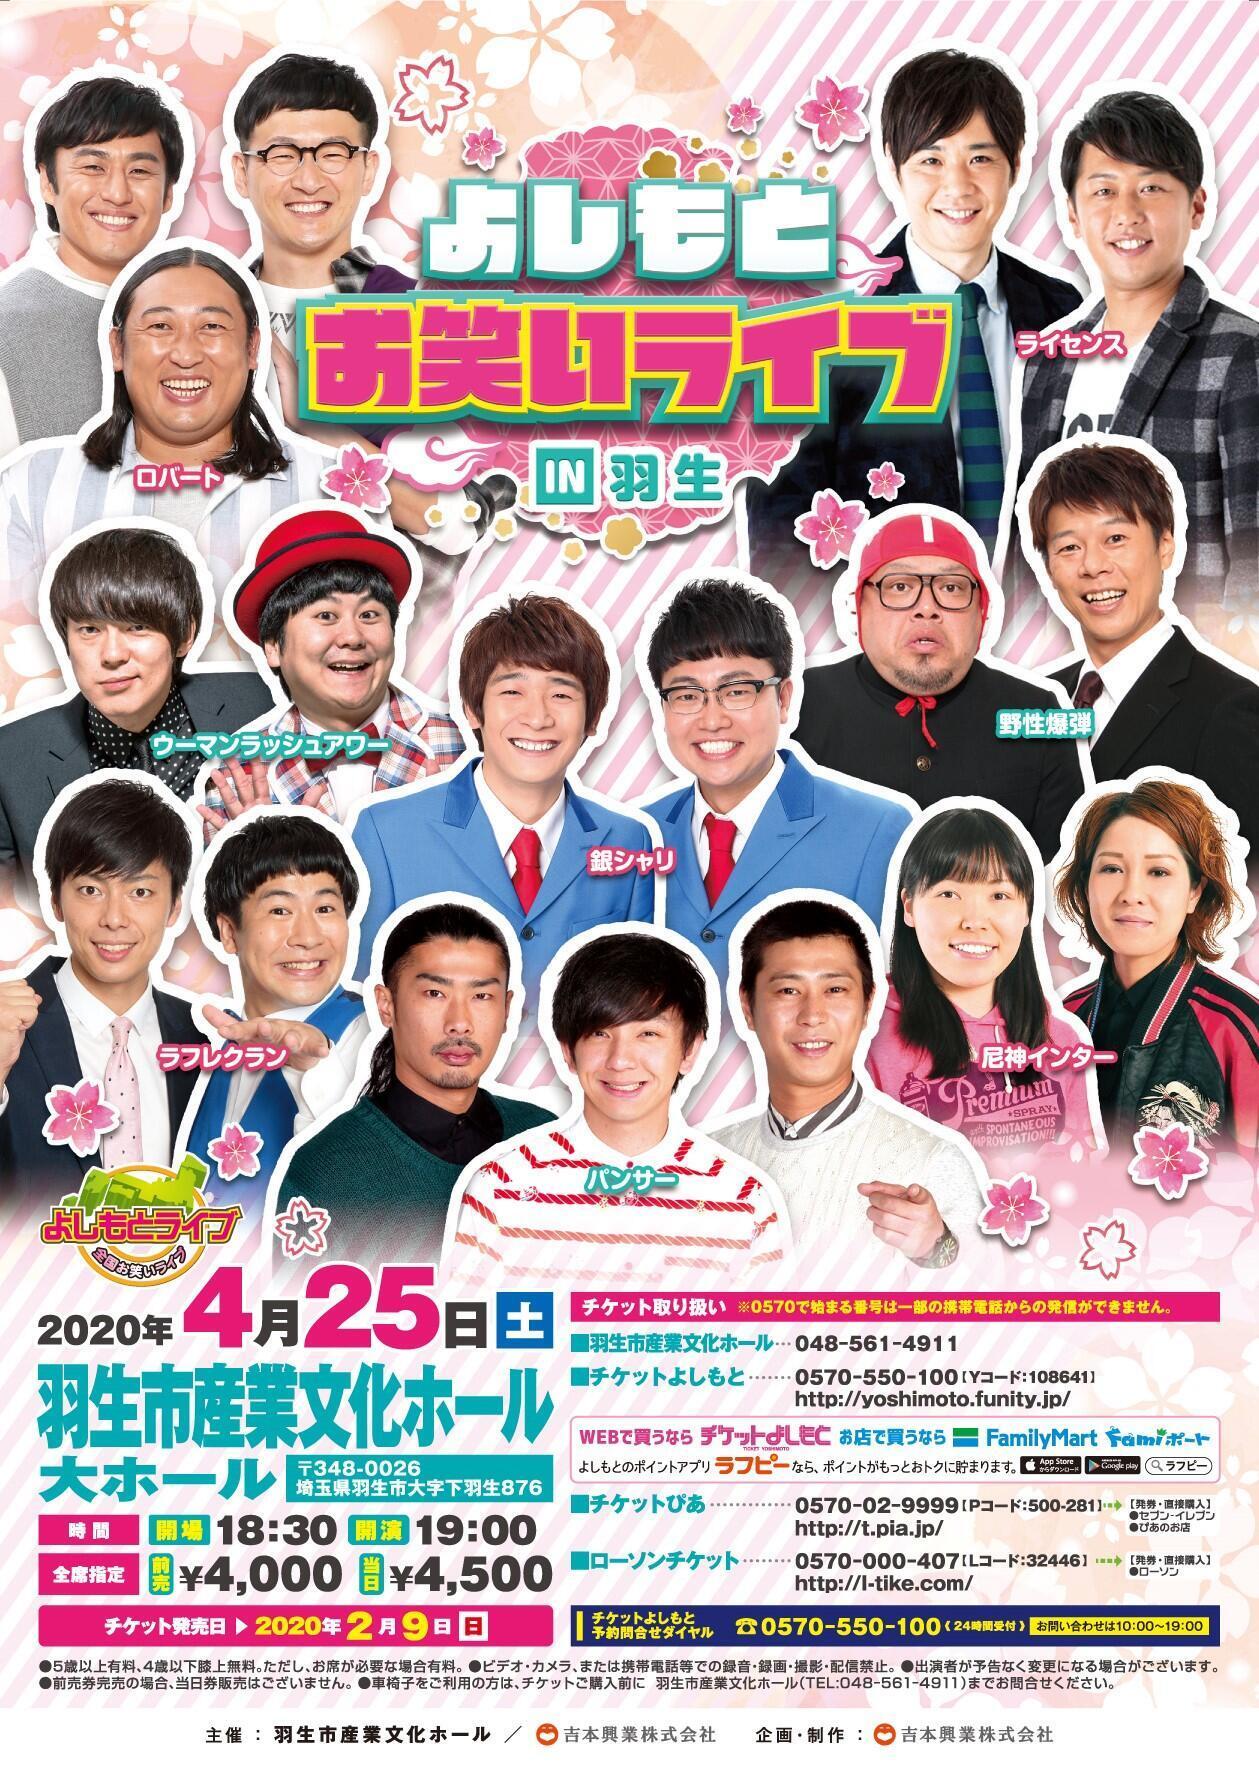 http://www.syumatsu.jp/20200206124053-bad0d8923ad0183d5cc9edf3656be86d4e085330.jpg